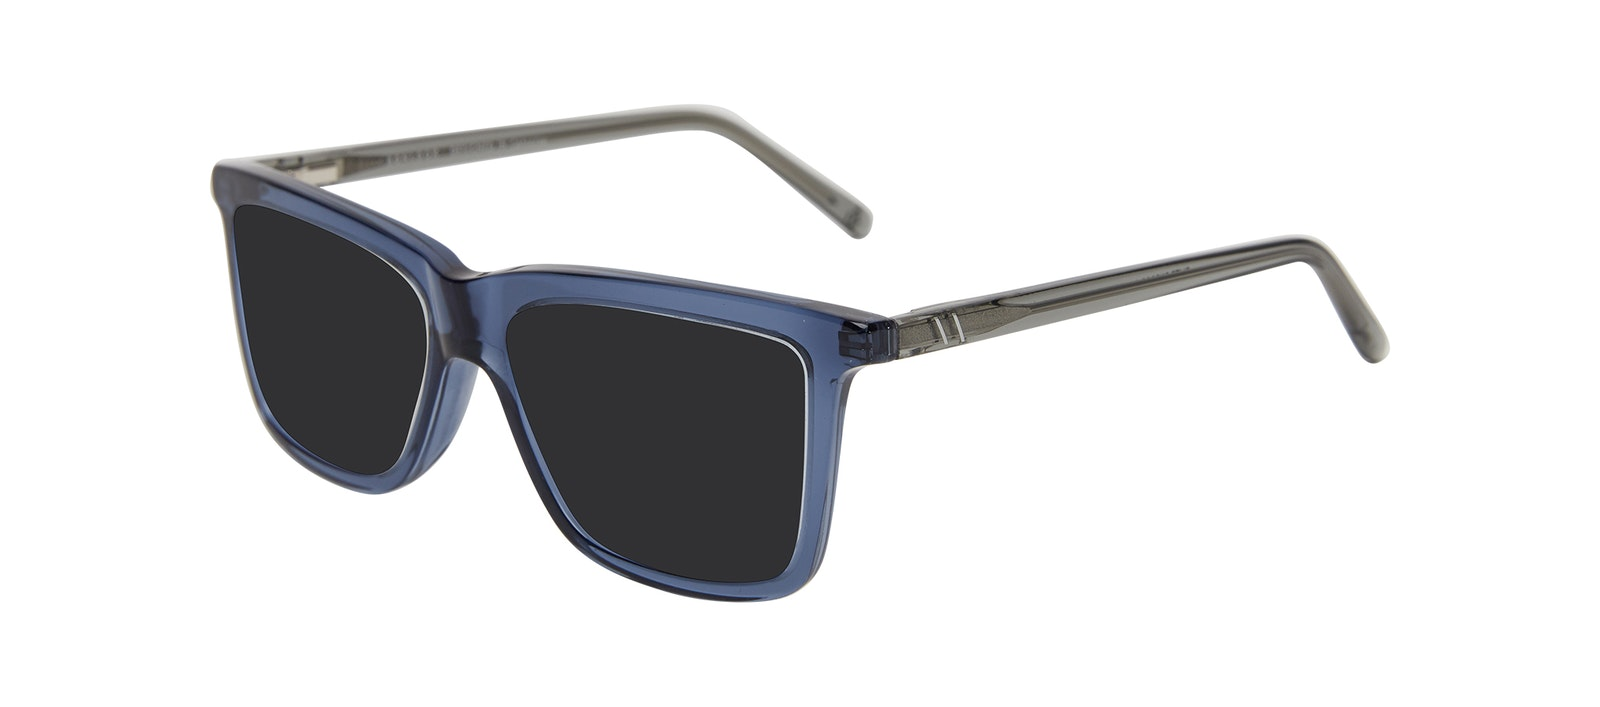 Affordable Fashion Glasses Square Sunglasses Kids Elite Junior Oxford Blue Tilt